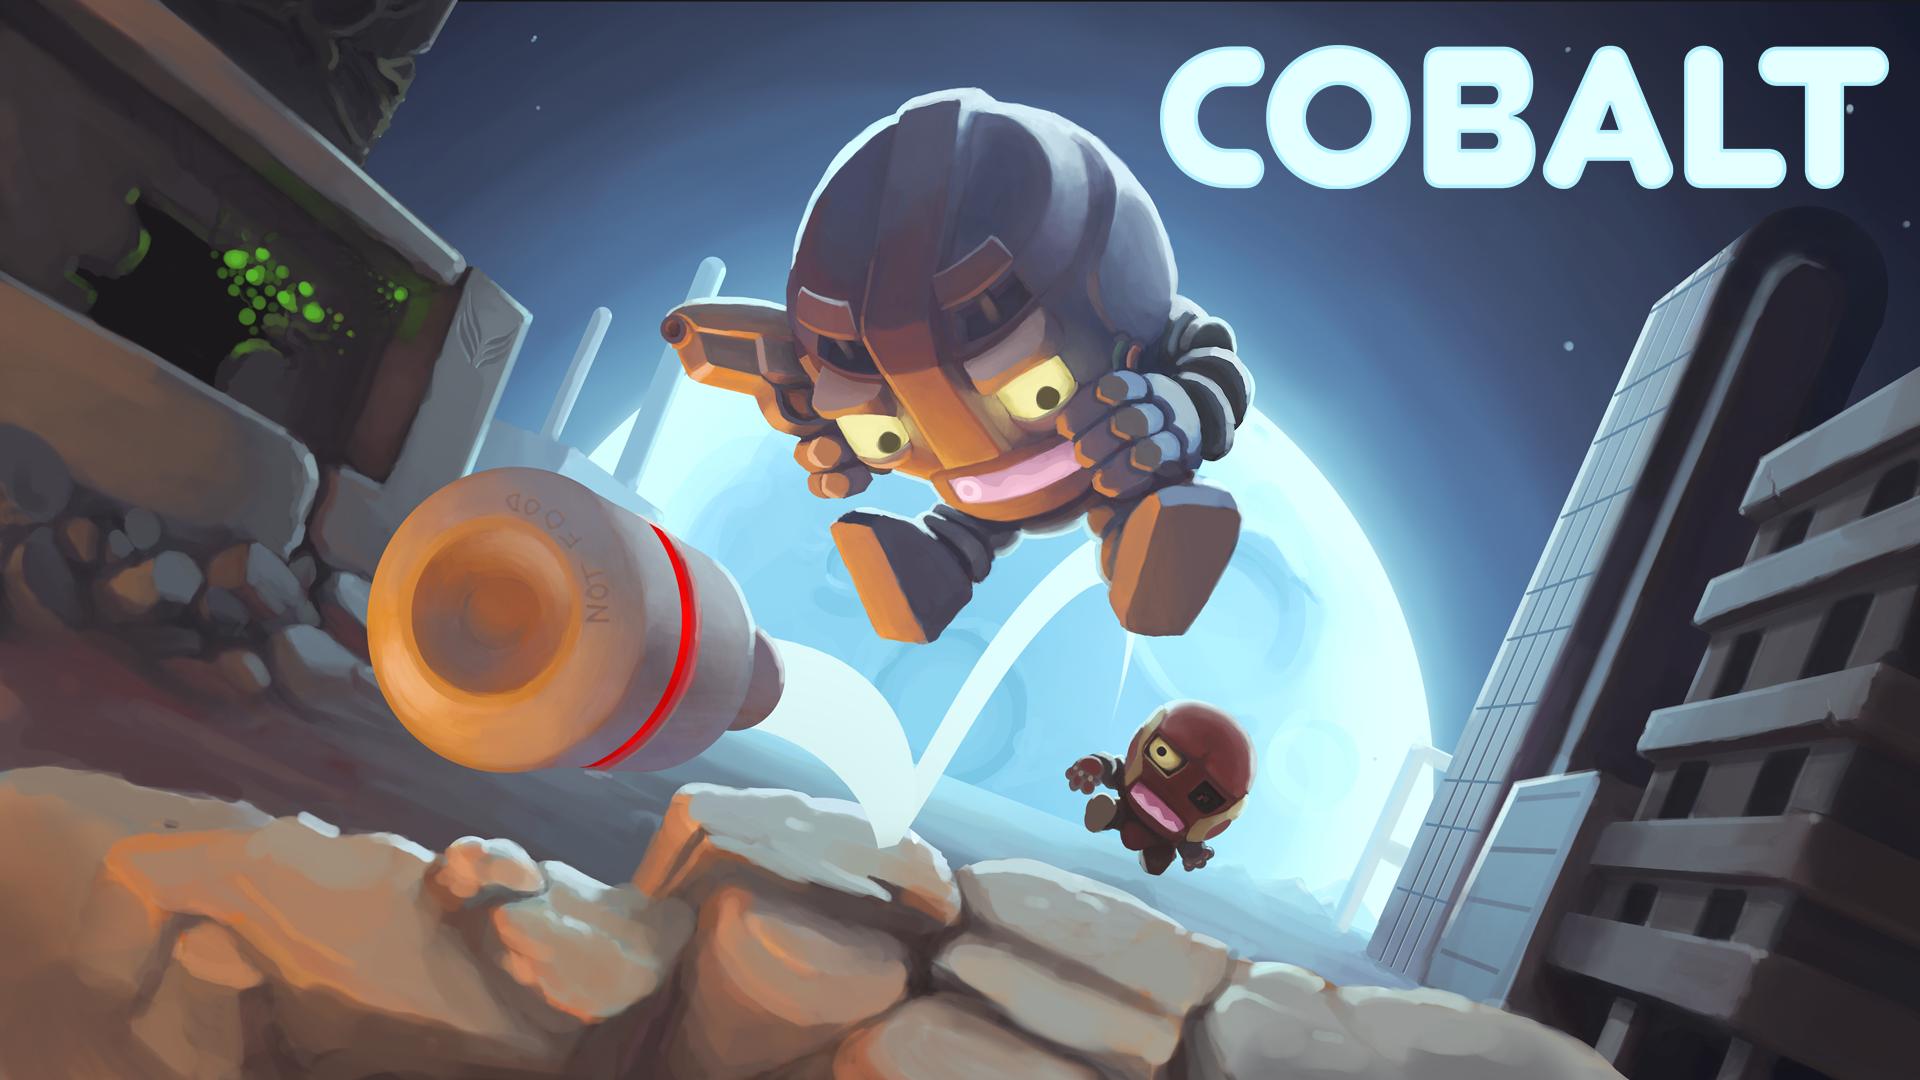 cobalt_splashscreen_1920x180